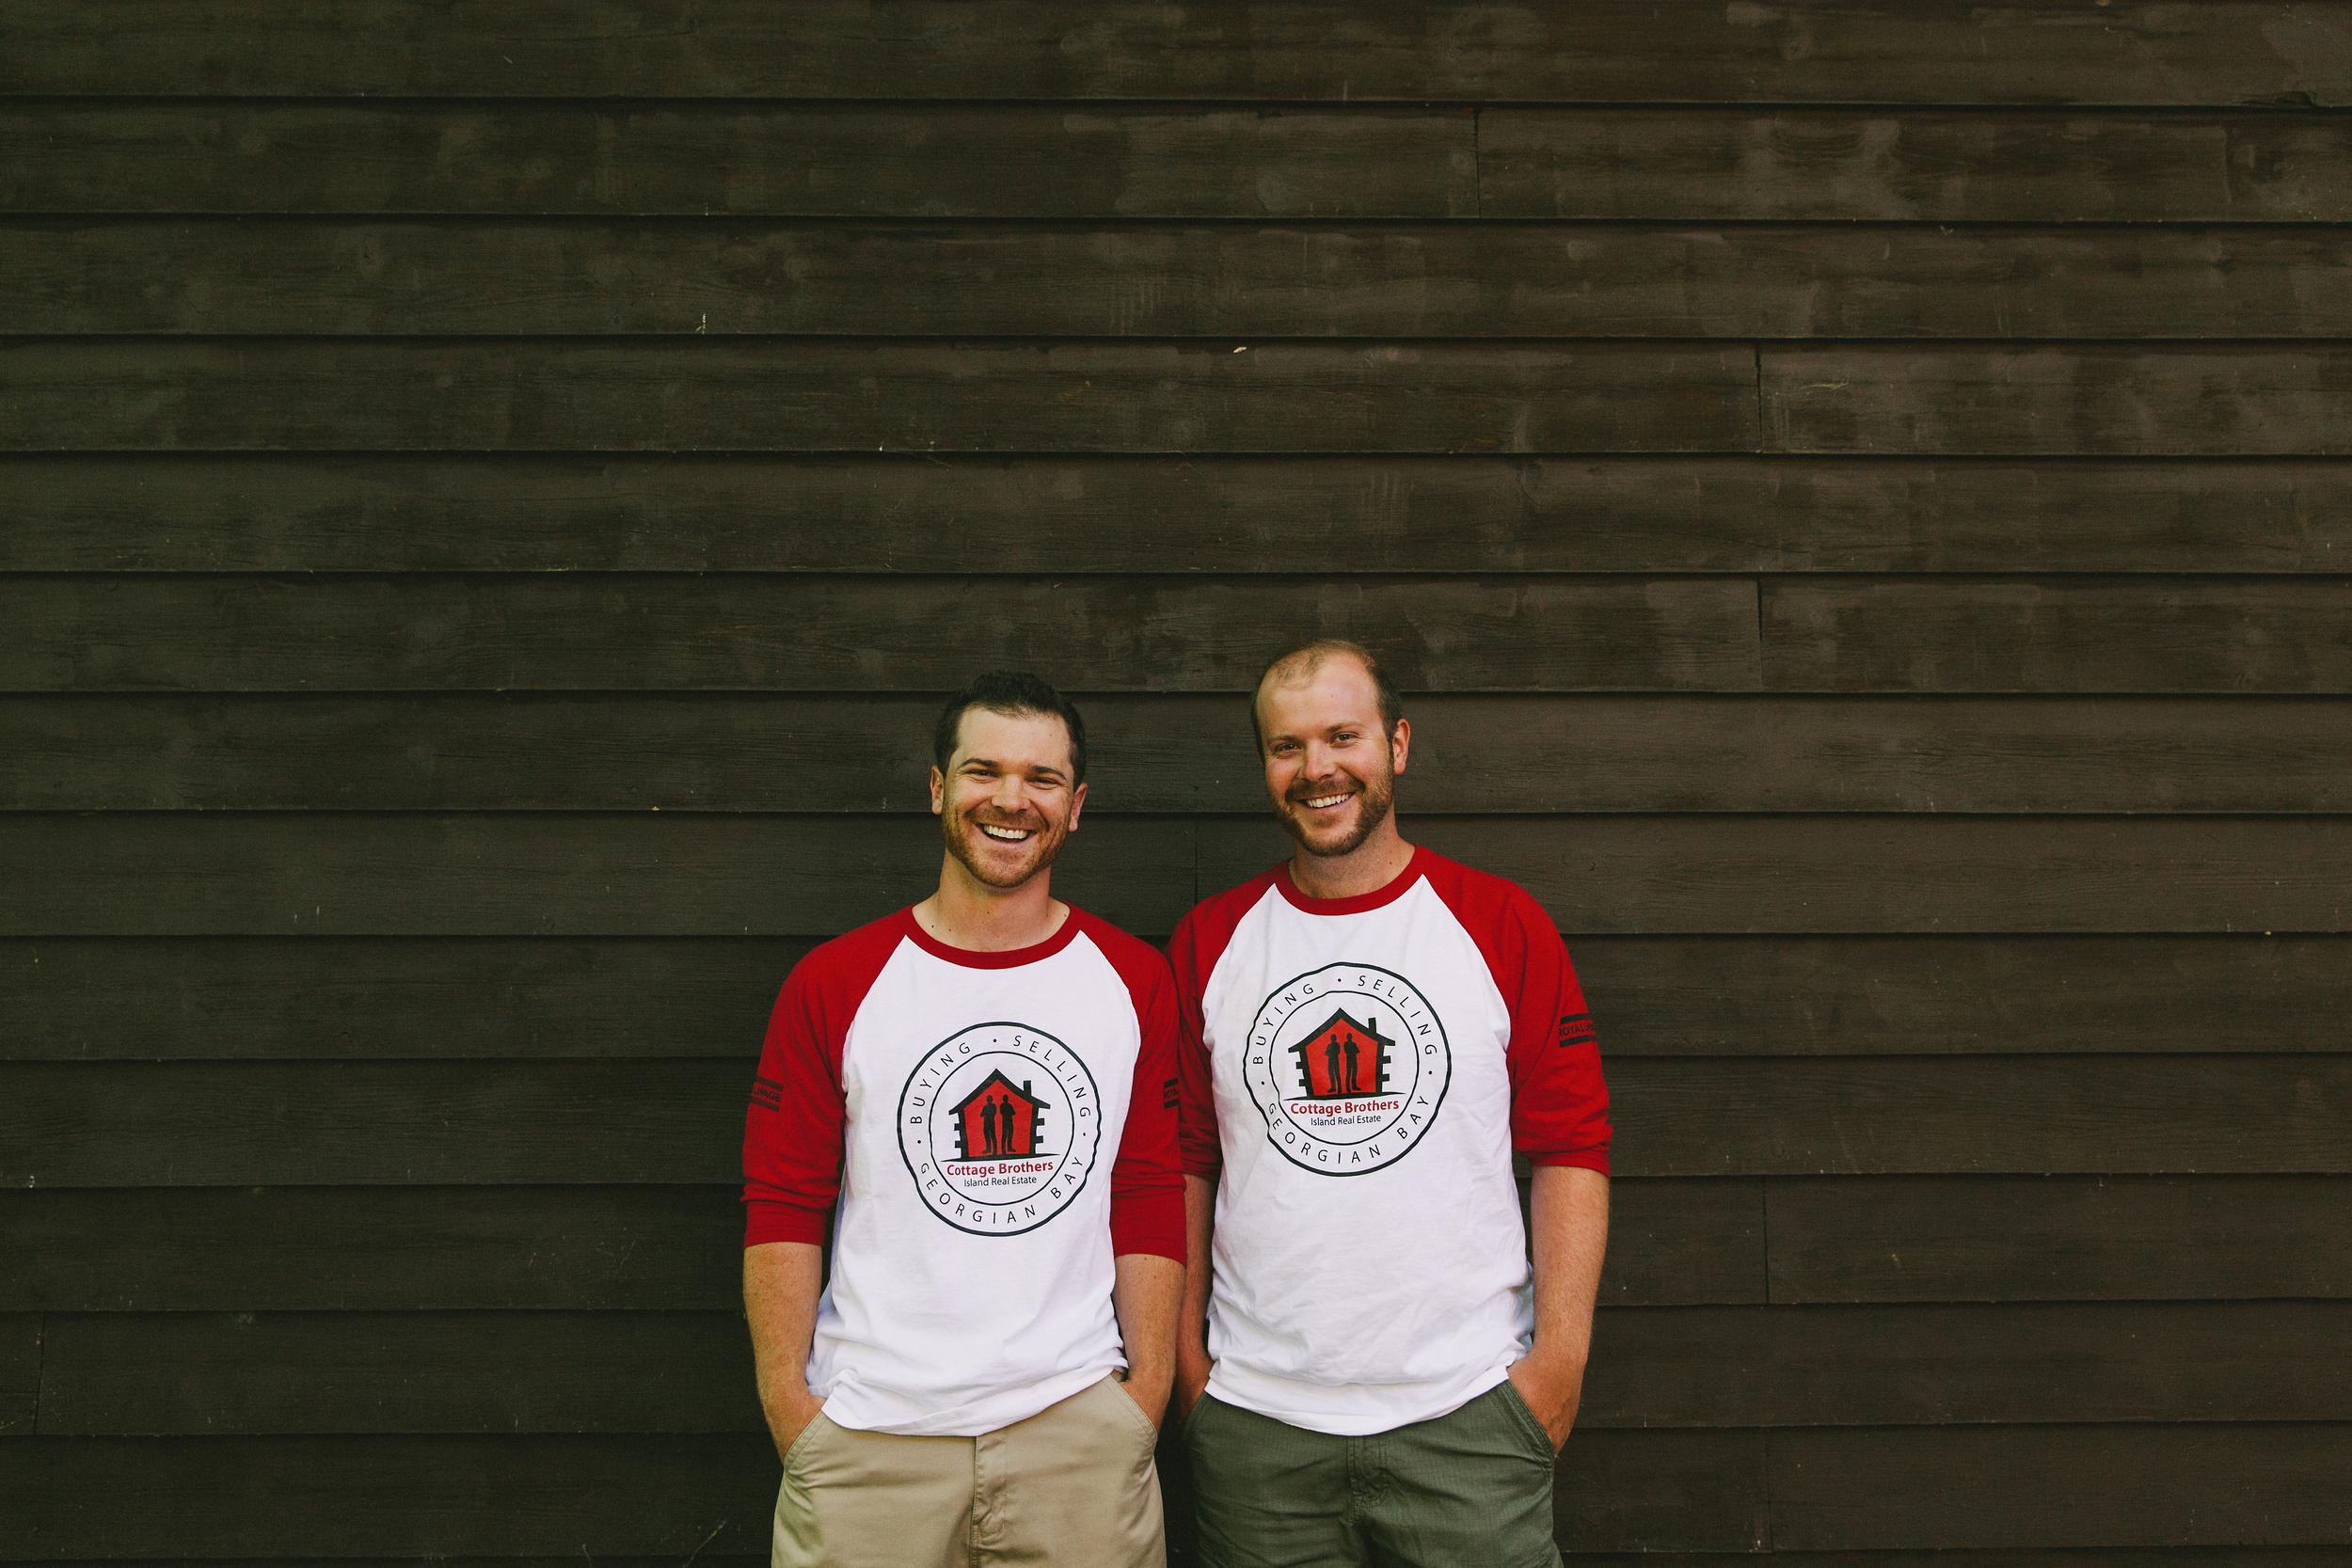 Todd & Scott Metherell